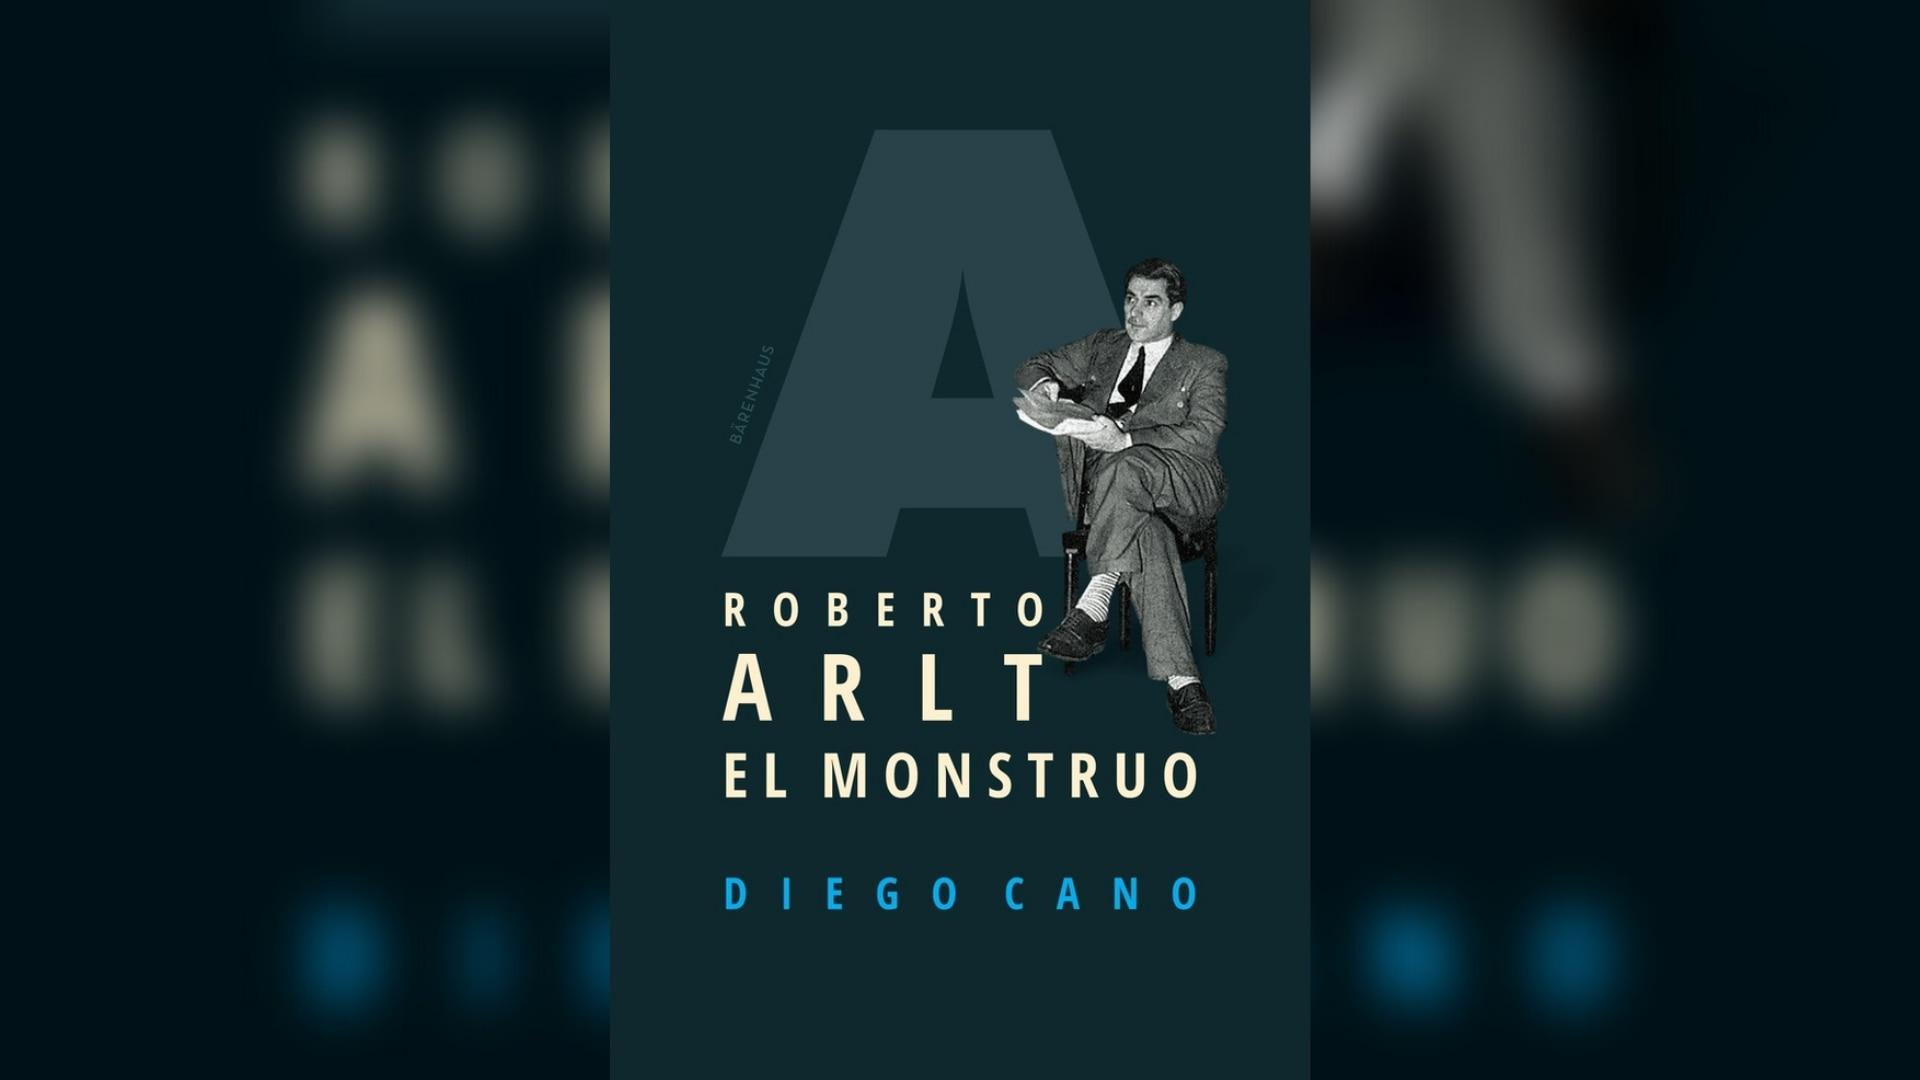 """Roberto Arlt, el monstruo"" (Bärenhaus, 2021) de Diego Cano"